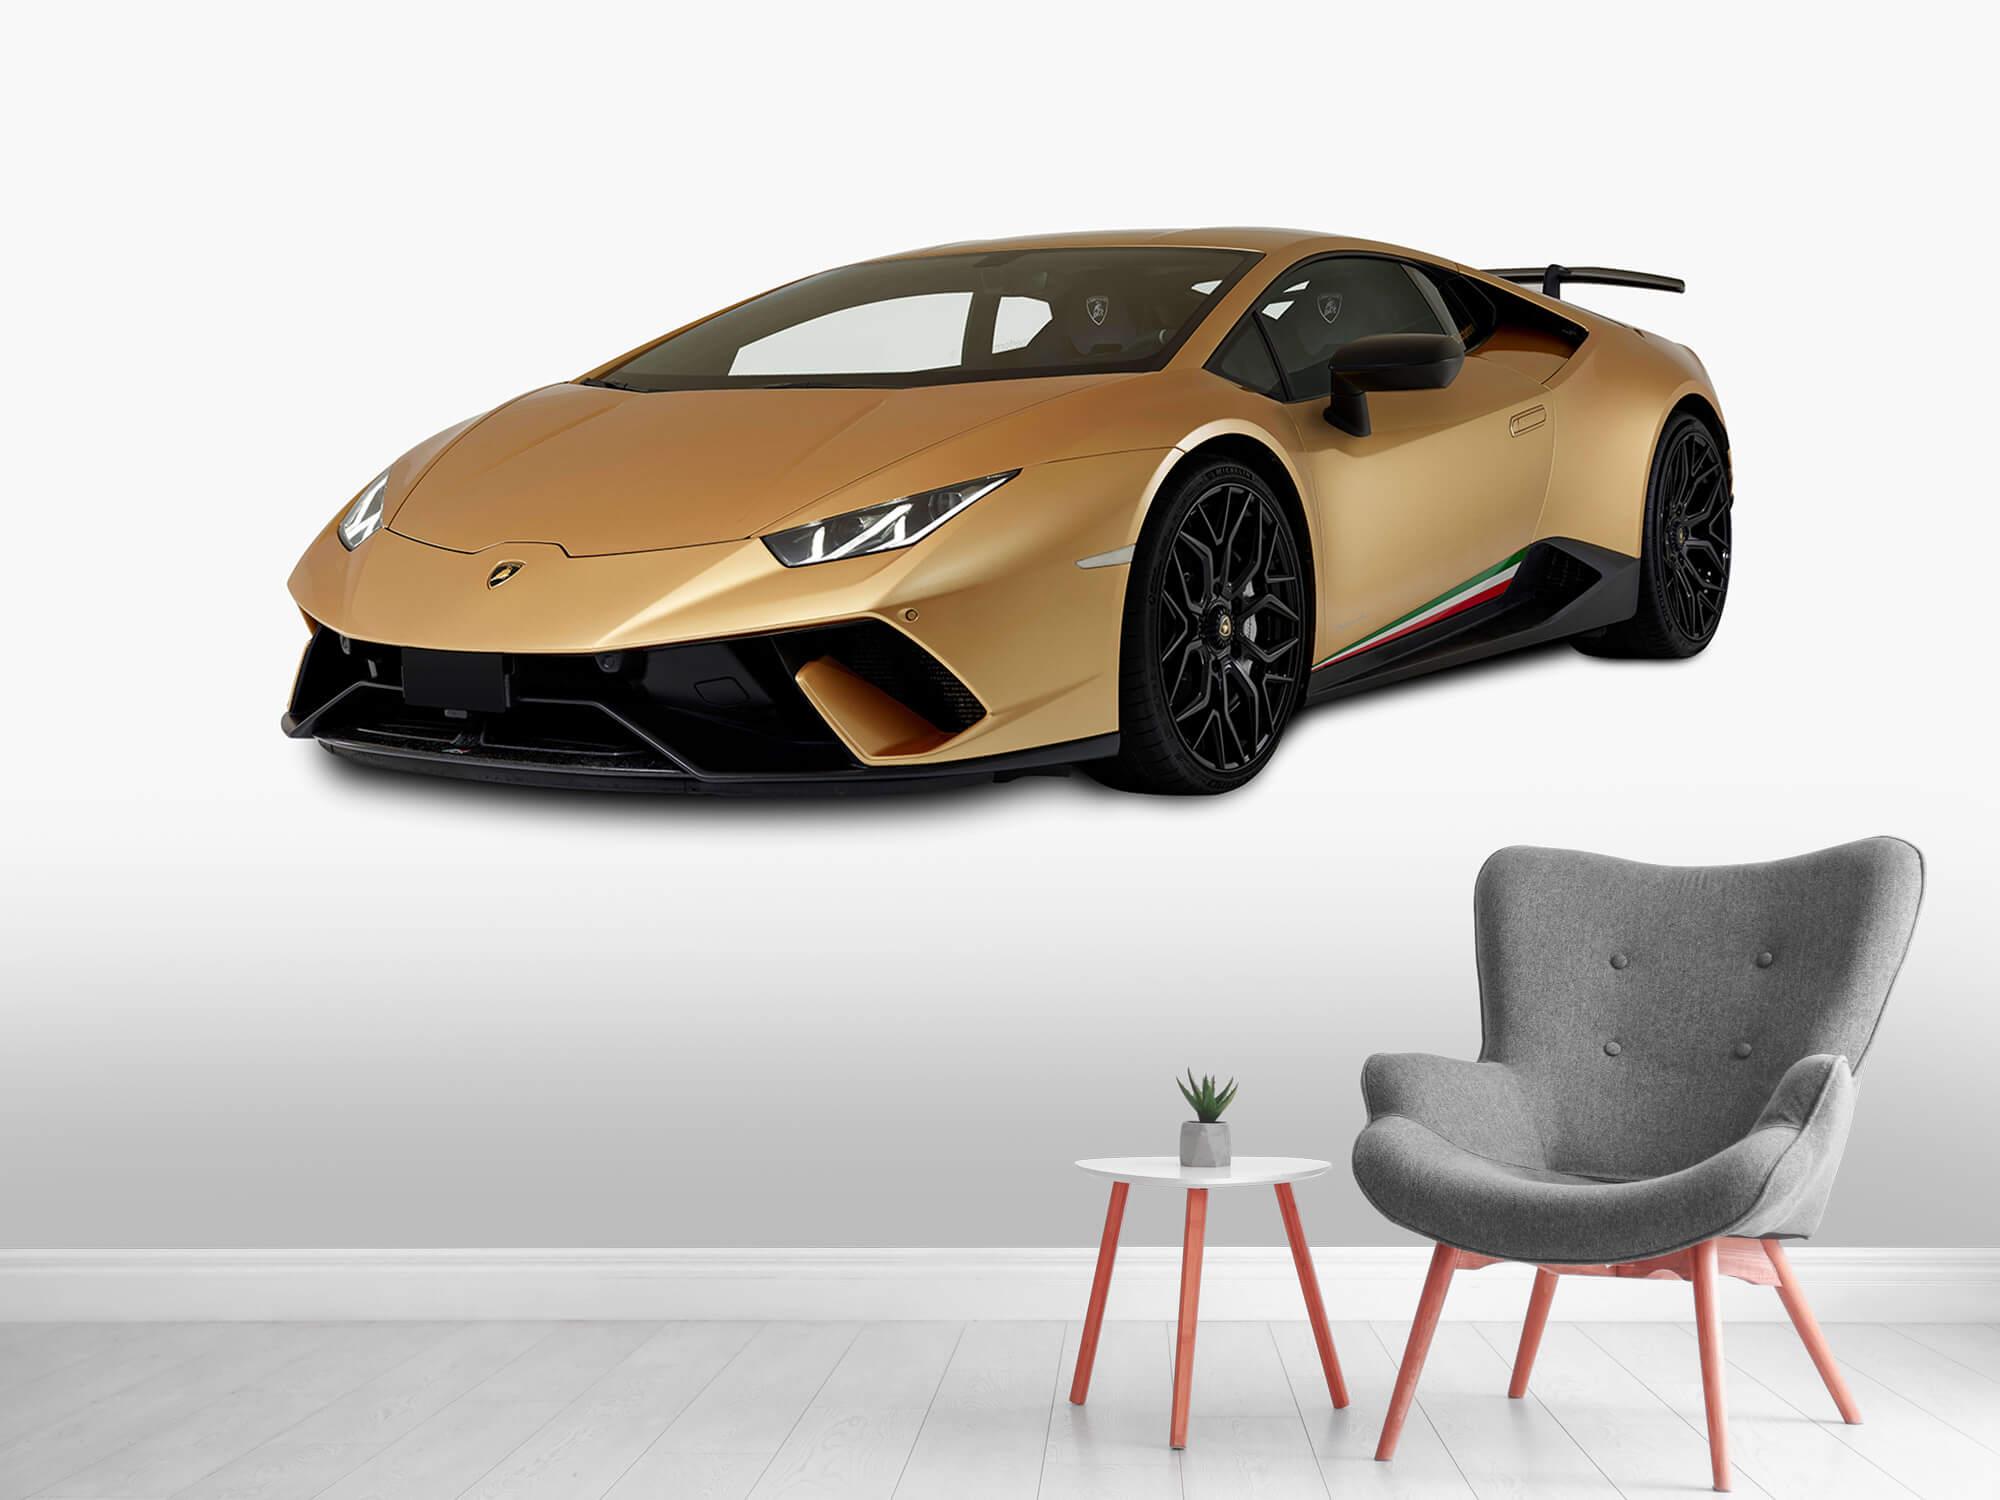 Wallpaper Lamborghini Huracán - Rechter voorkant wit 9